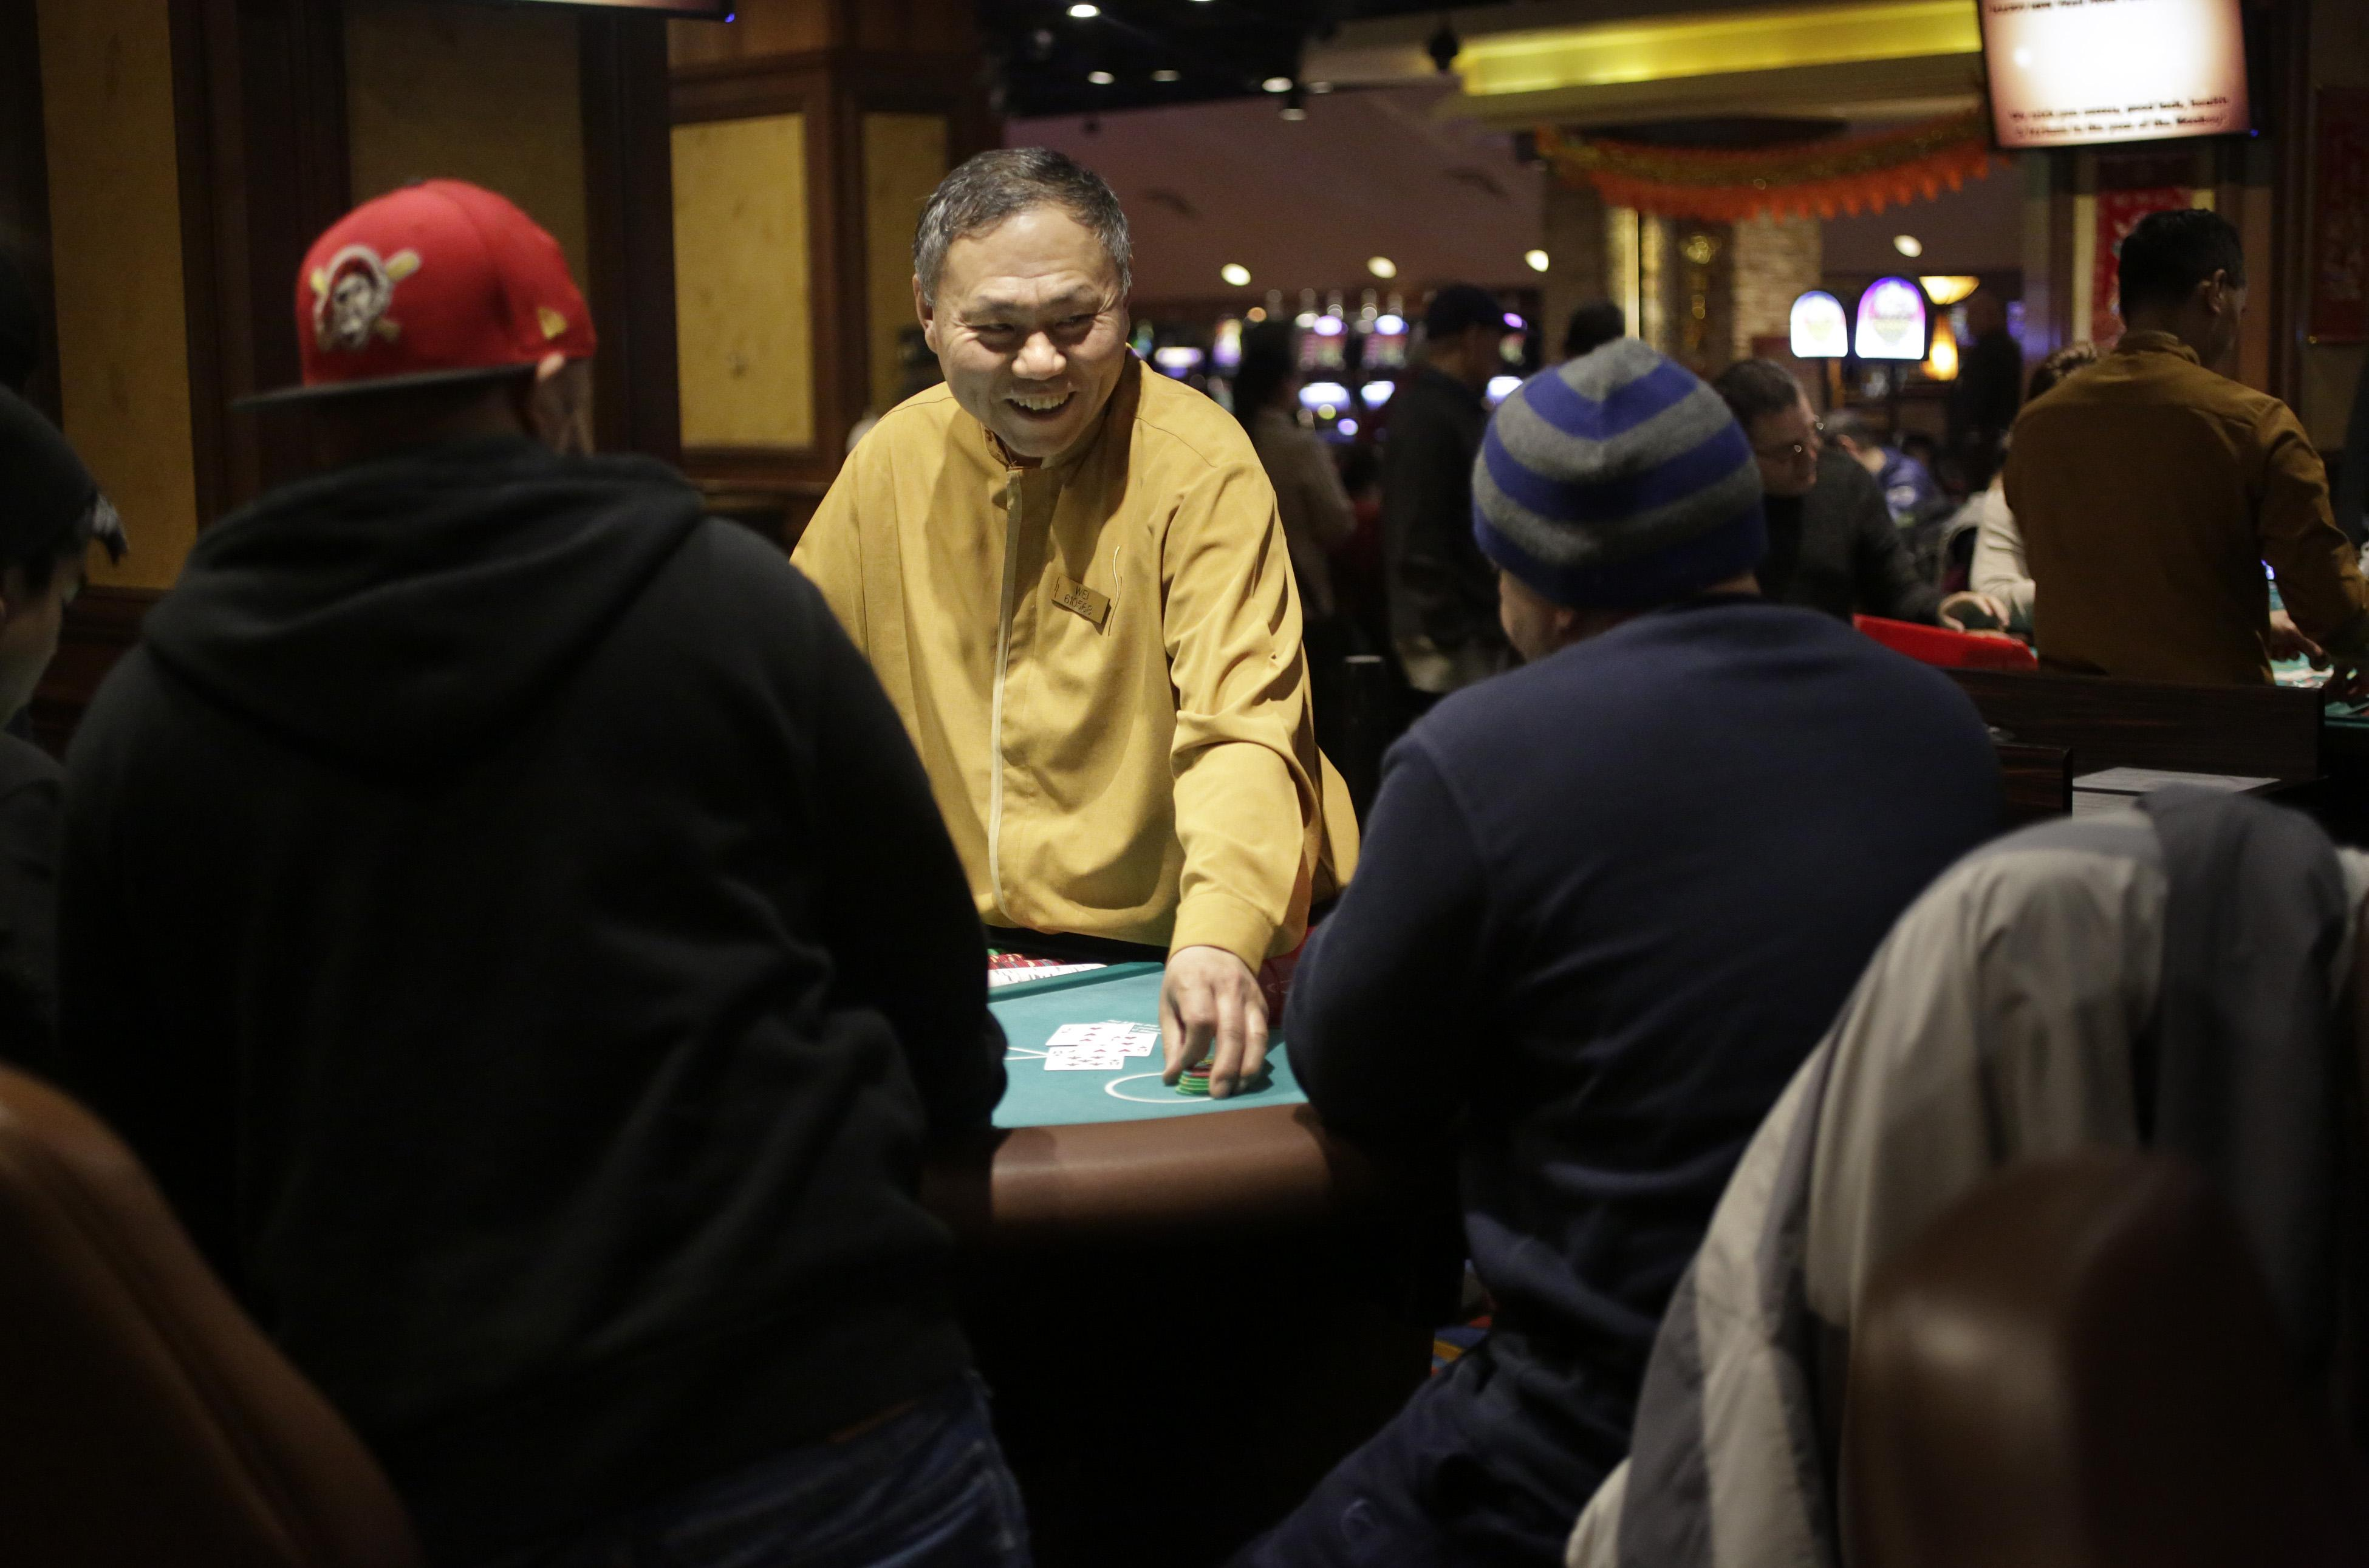 River rock casino blackjack tournament